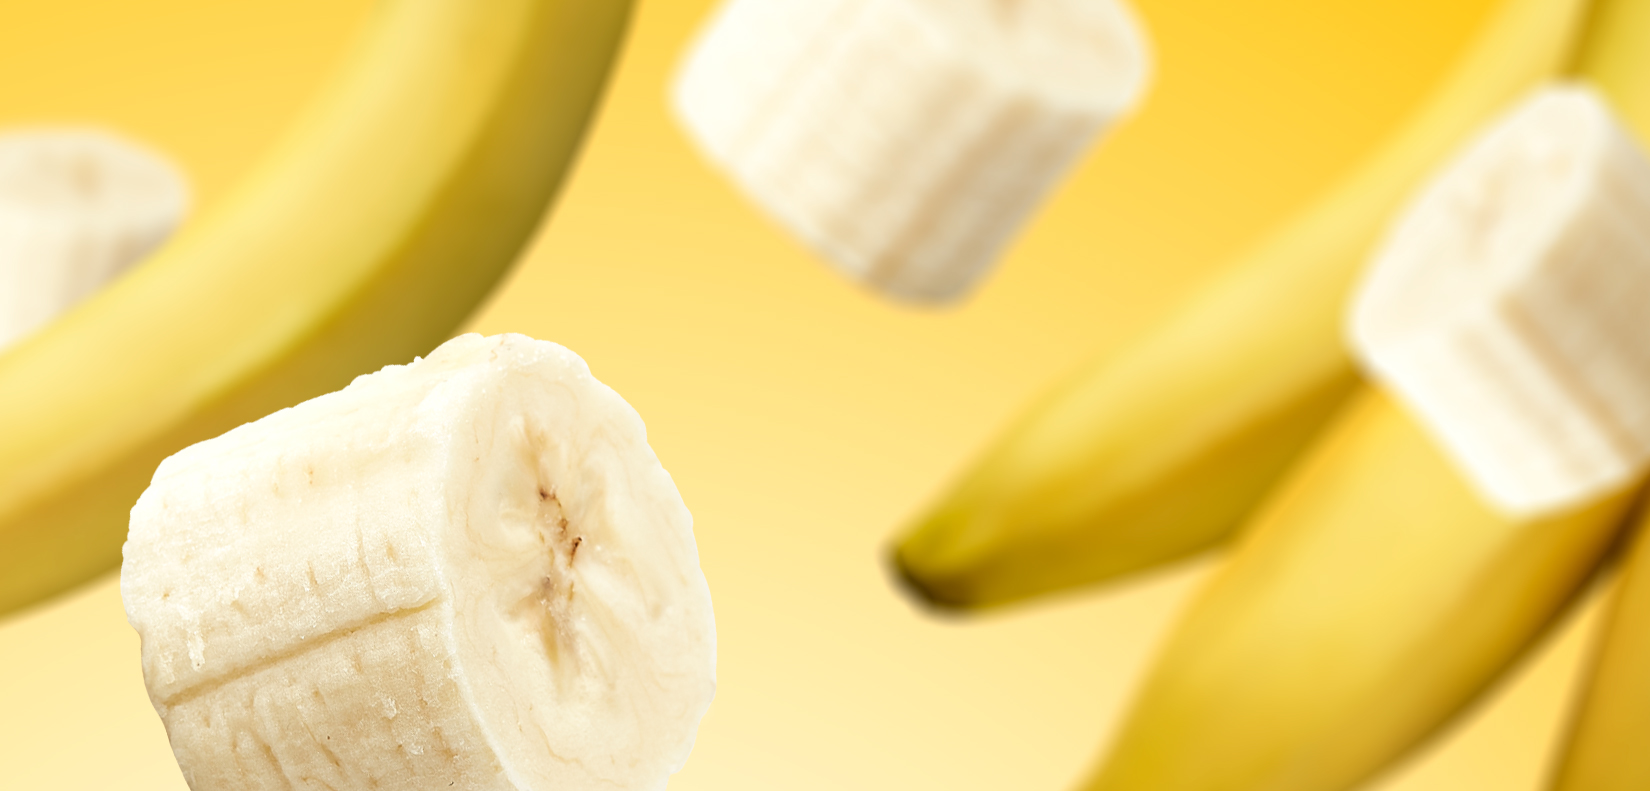 ASM® Süße Bananen Aroma Type 935621